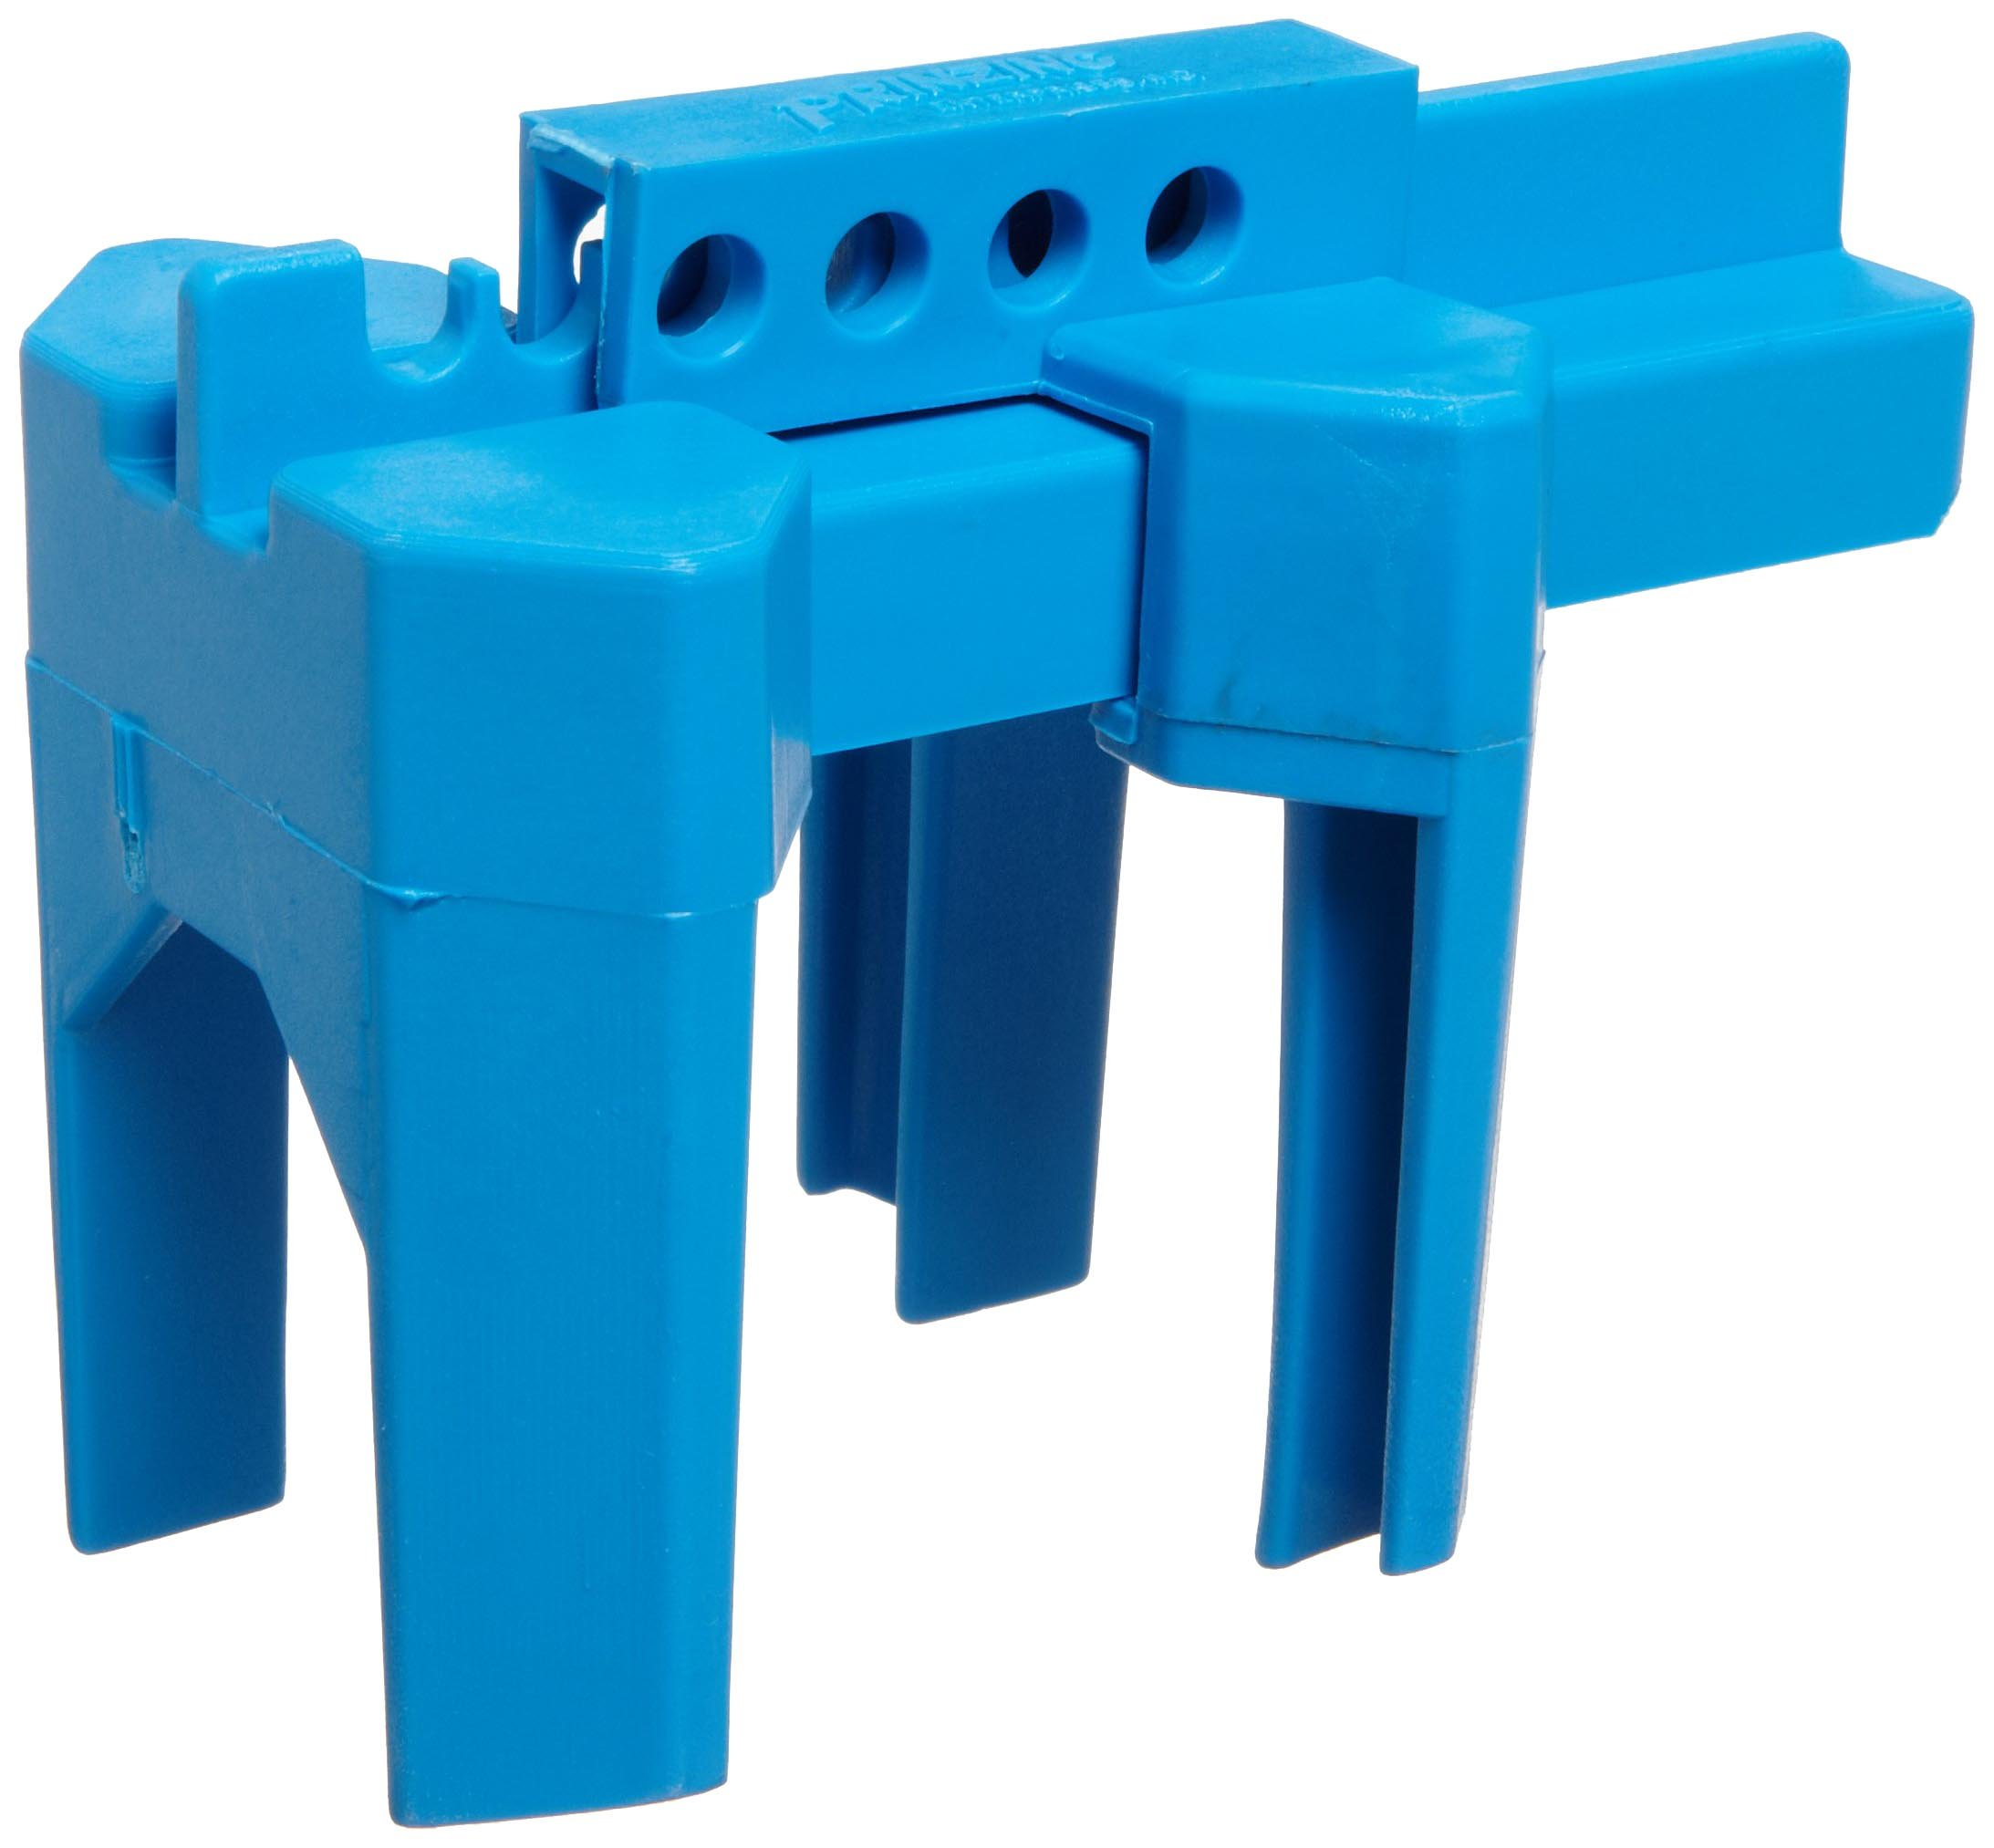 Brady Prinzing Ball Valve Lockout, Small, for 1/2''-2-1/2'' Outside Pipe Diameter, Blue